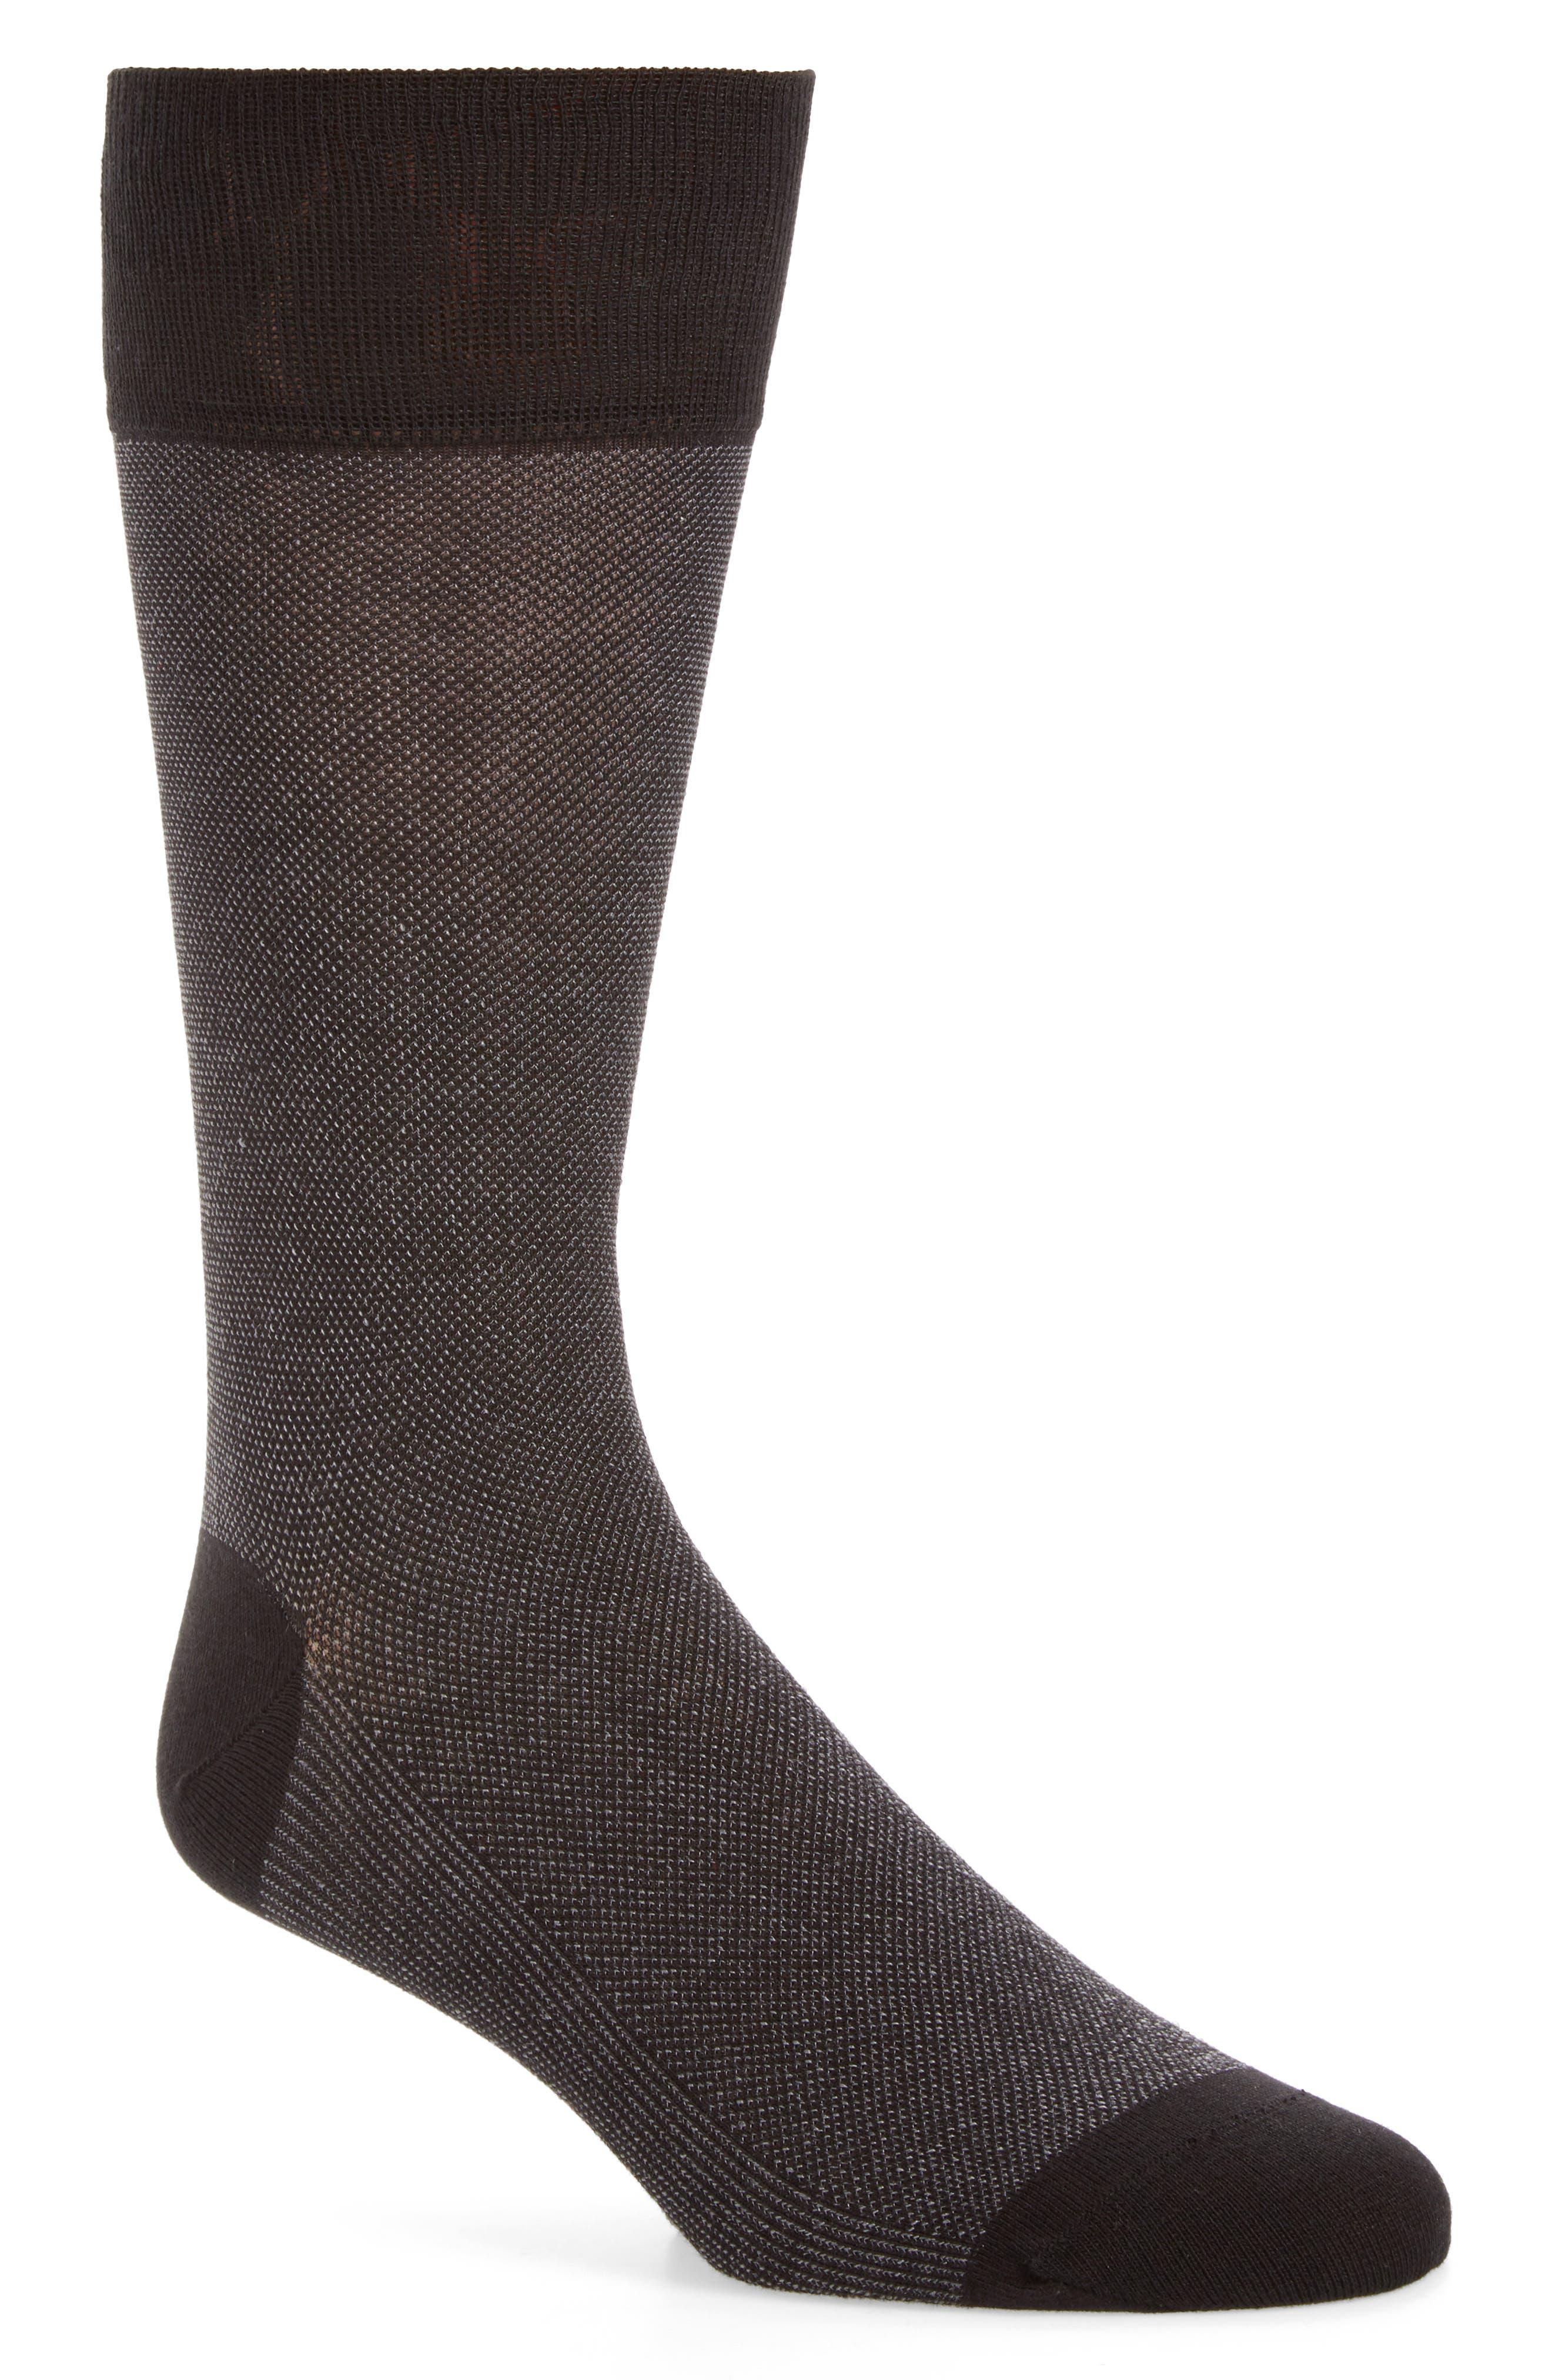 Vintage Men's Socks History-1900 to 1960s Mens Cole Haan Pique Texture Crew Socks Size One Size - Black $12.50 AT vintagedancer.com